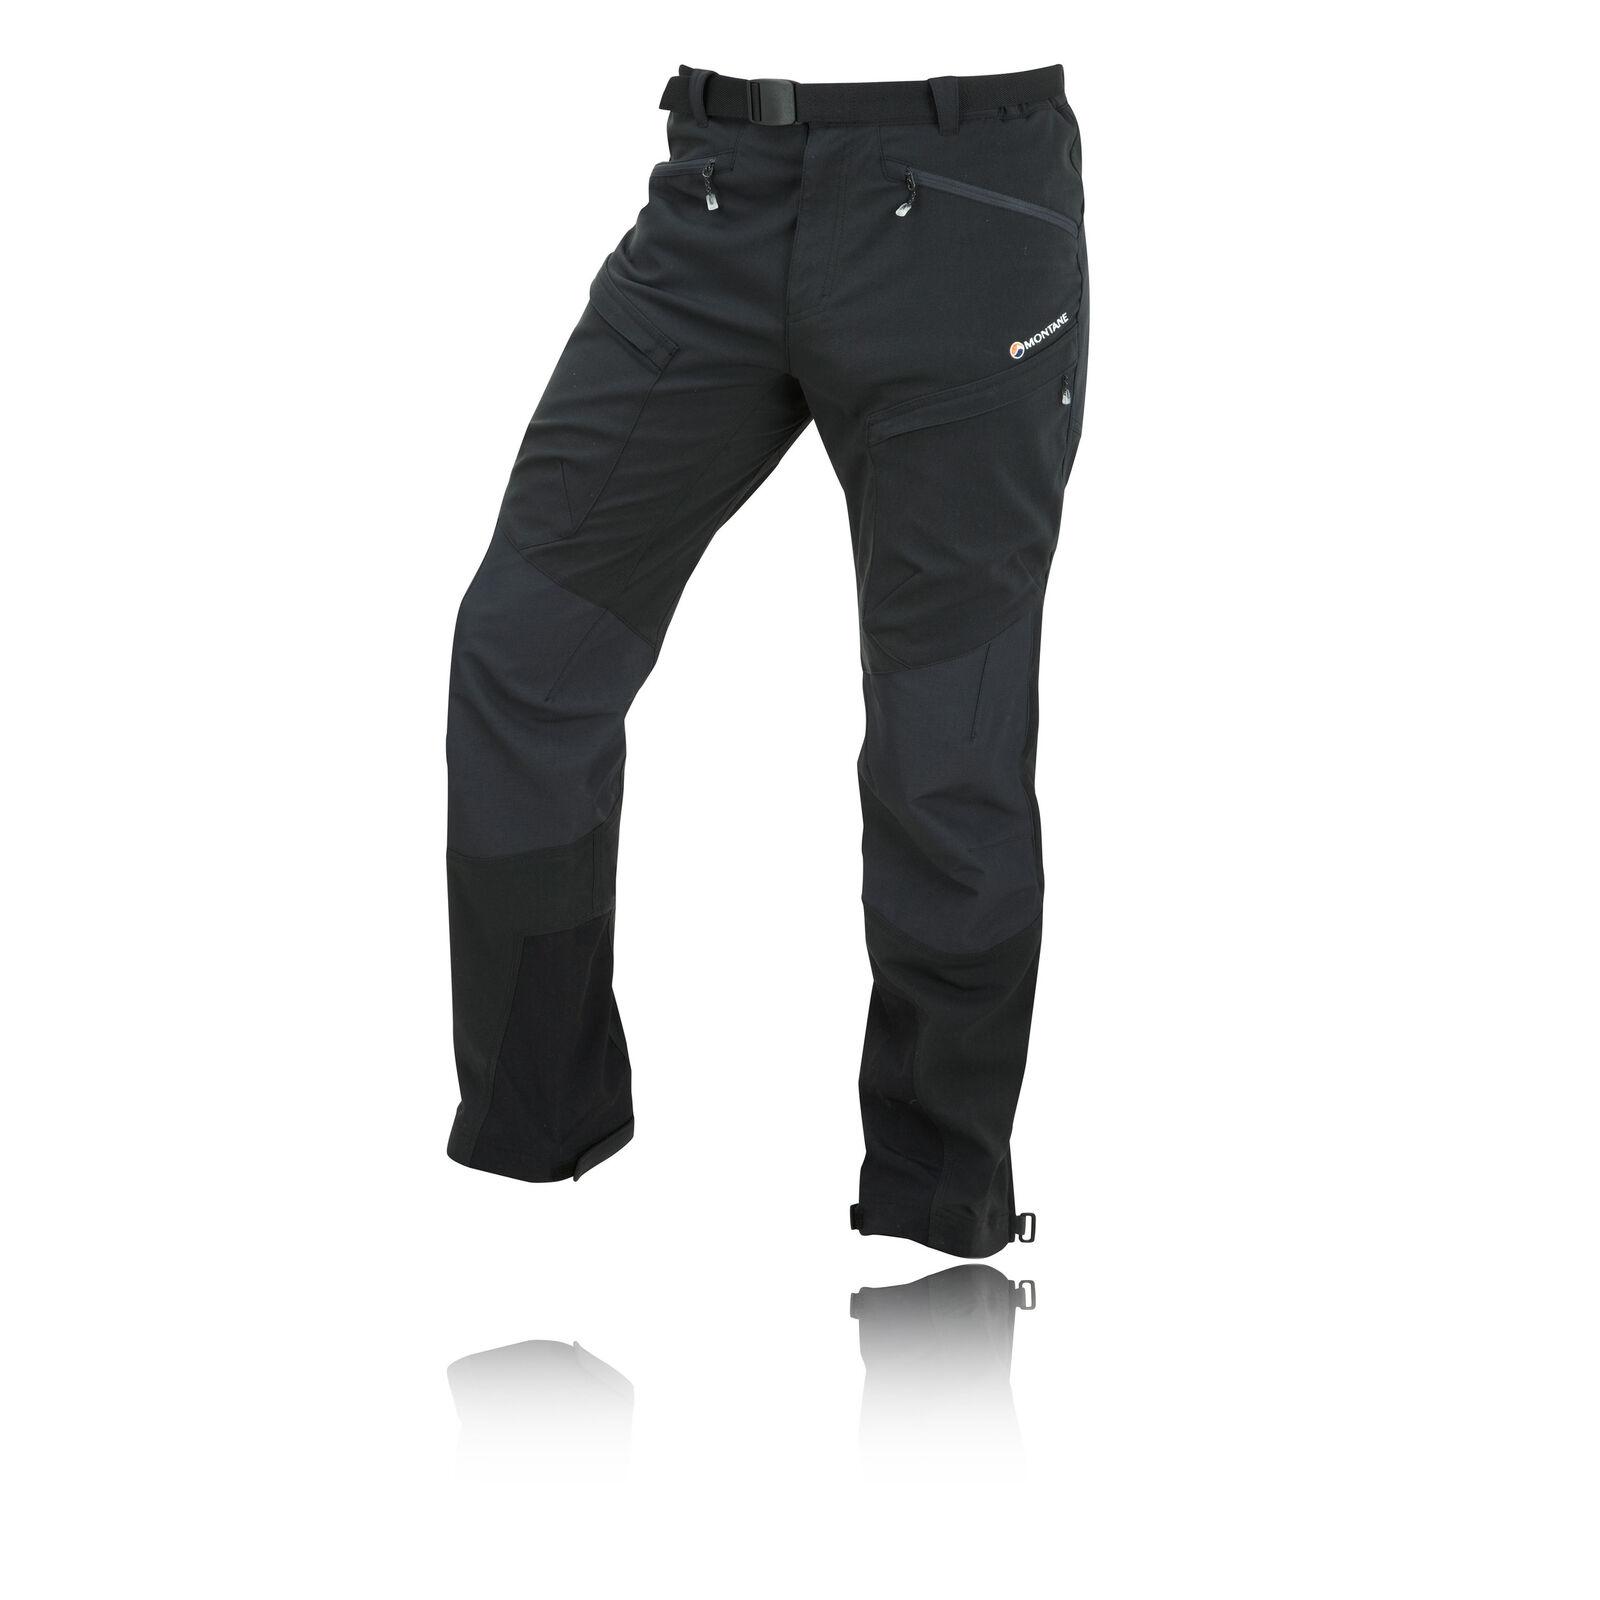 Montane Uomo Blu Super Terra all'aperto Pantaloni Gamba Corta Sport